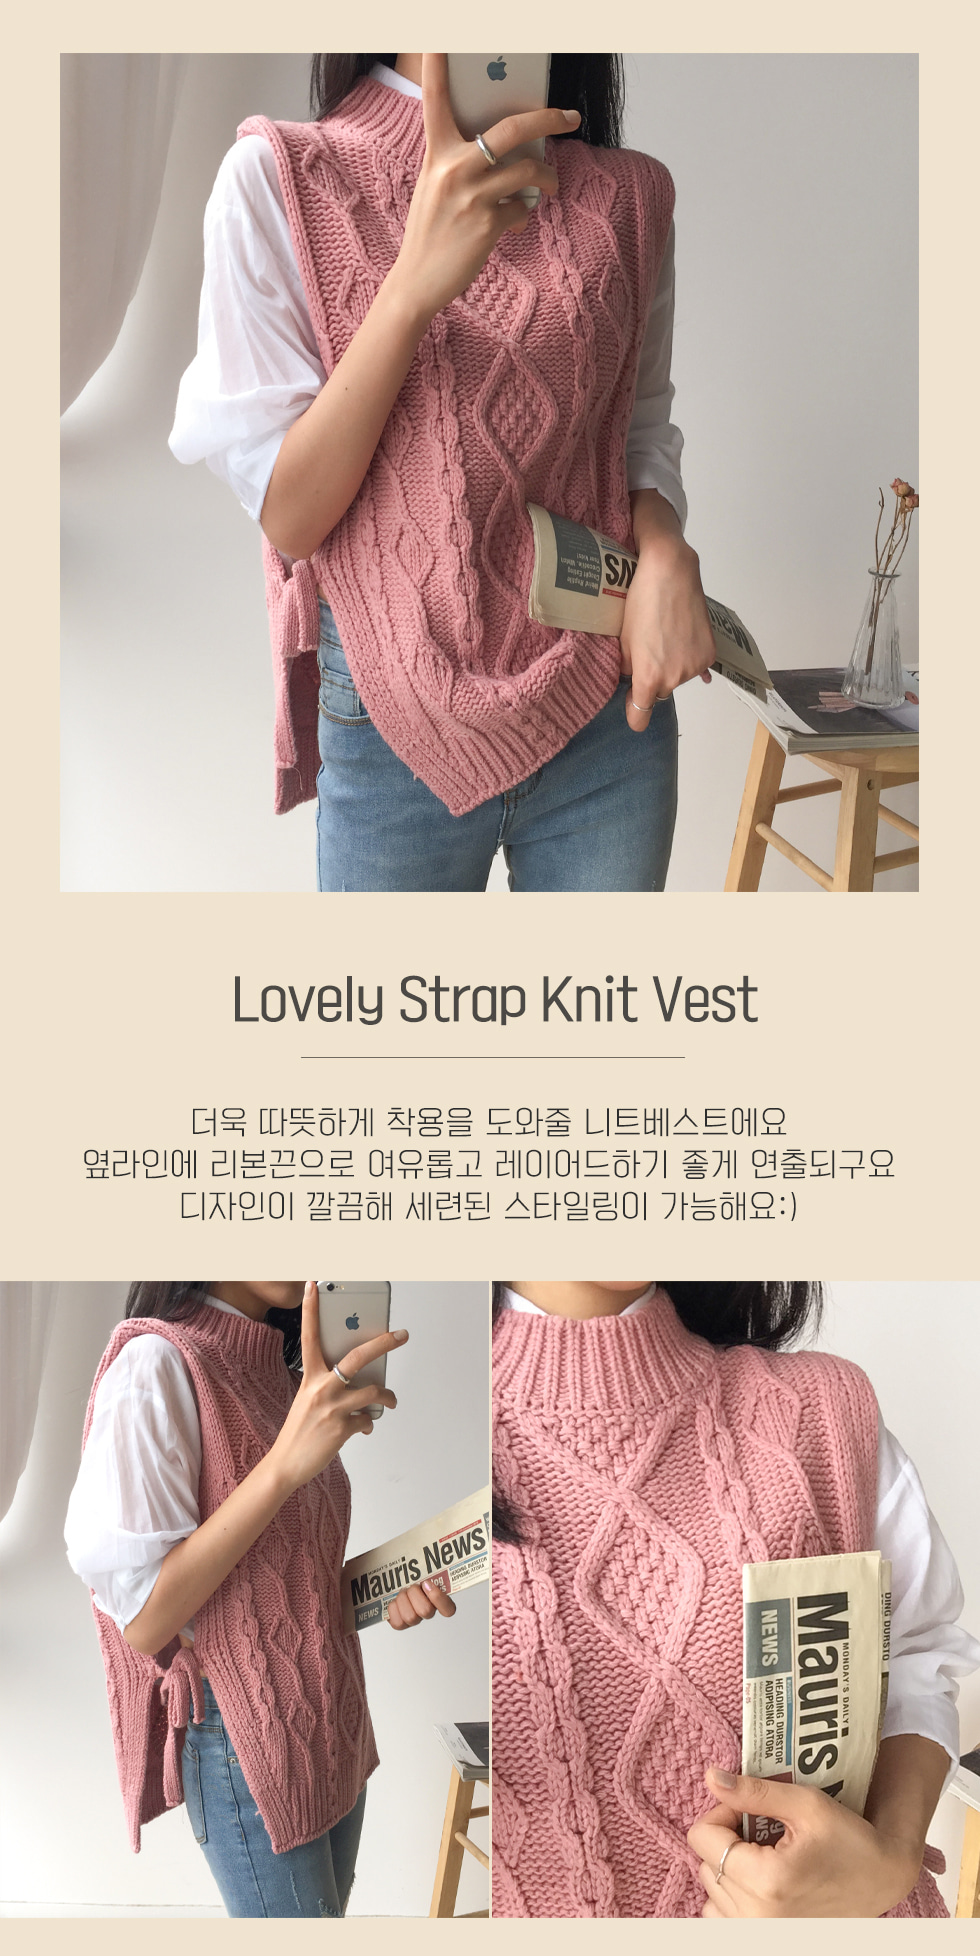 Strap 꽈 Vest